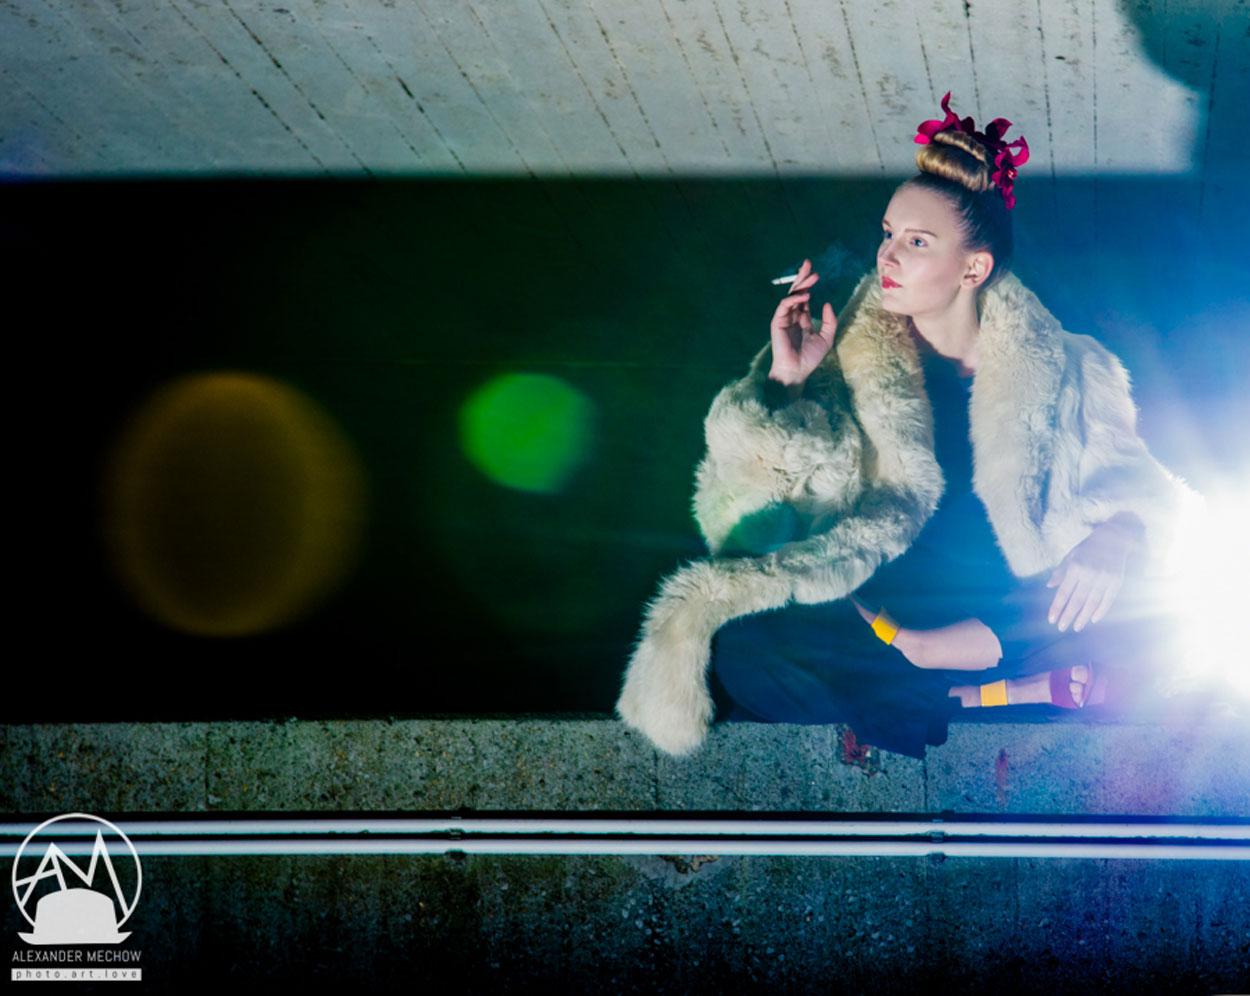 CITY-GEISHA-Alexander-Mechow-Photography--9